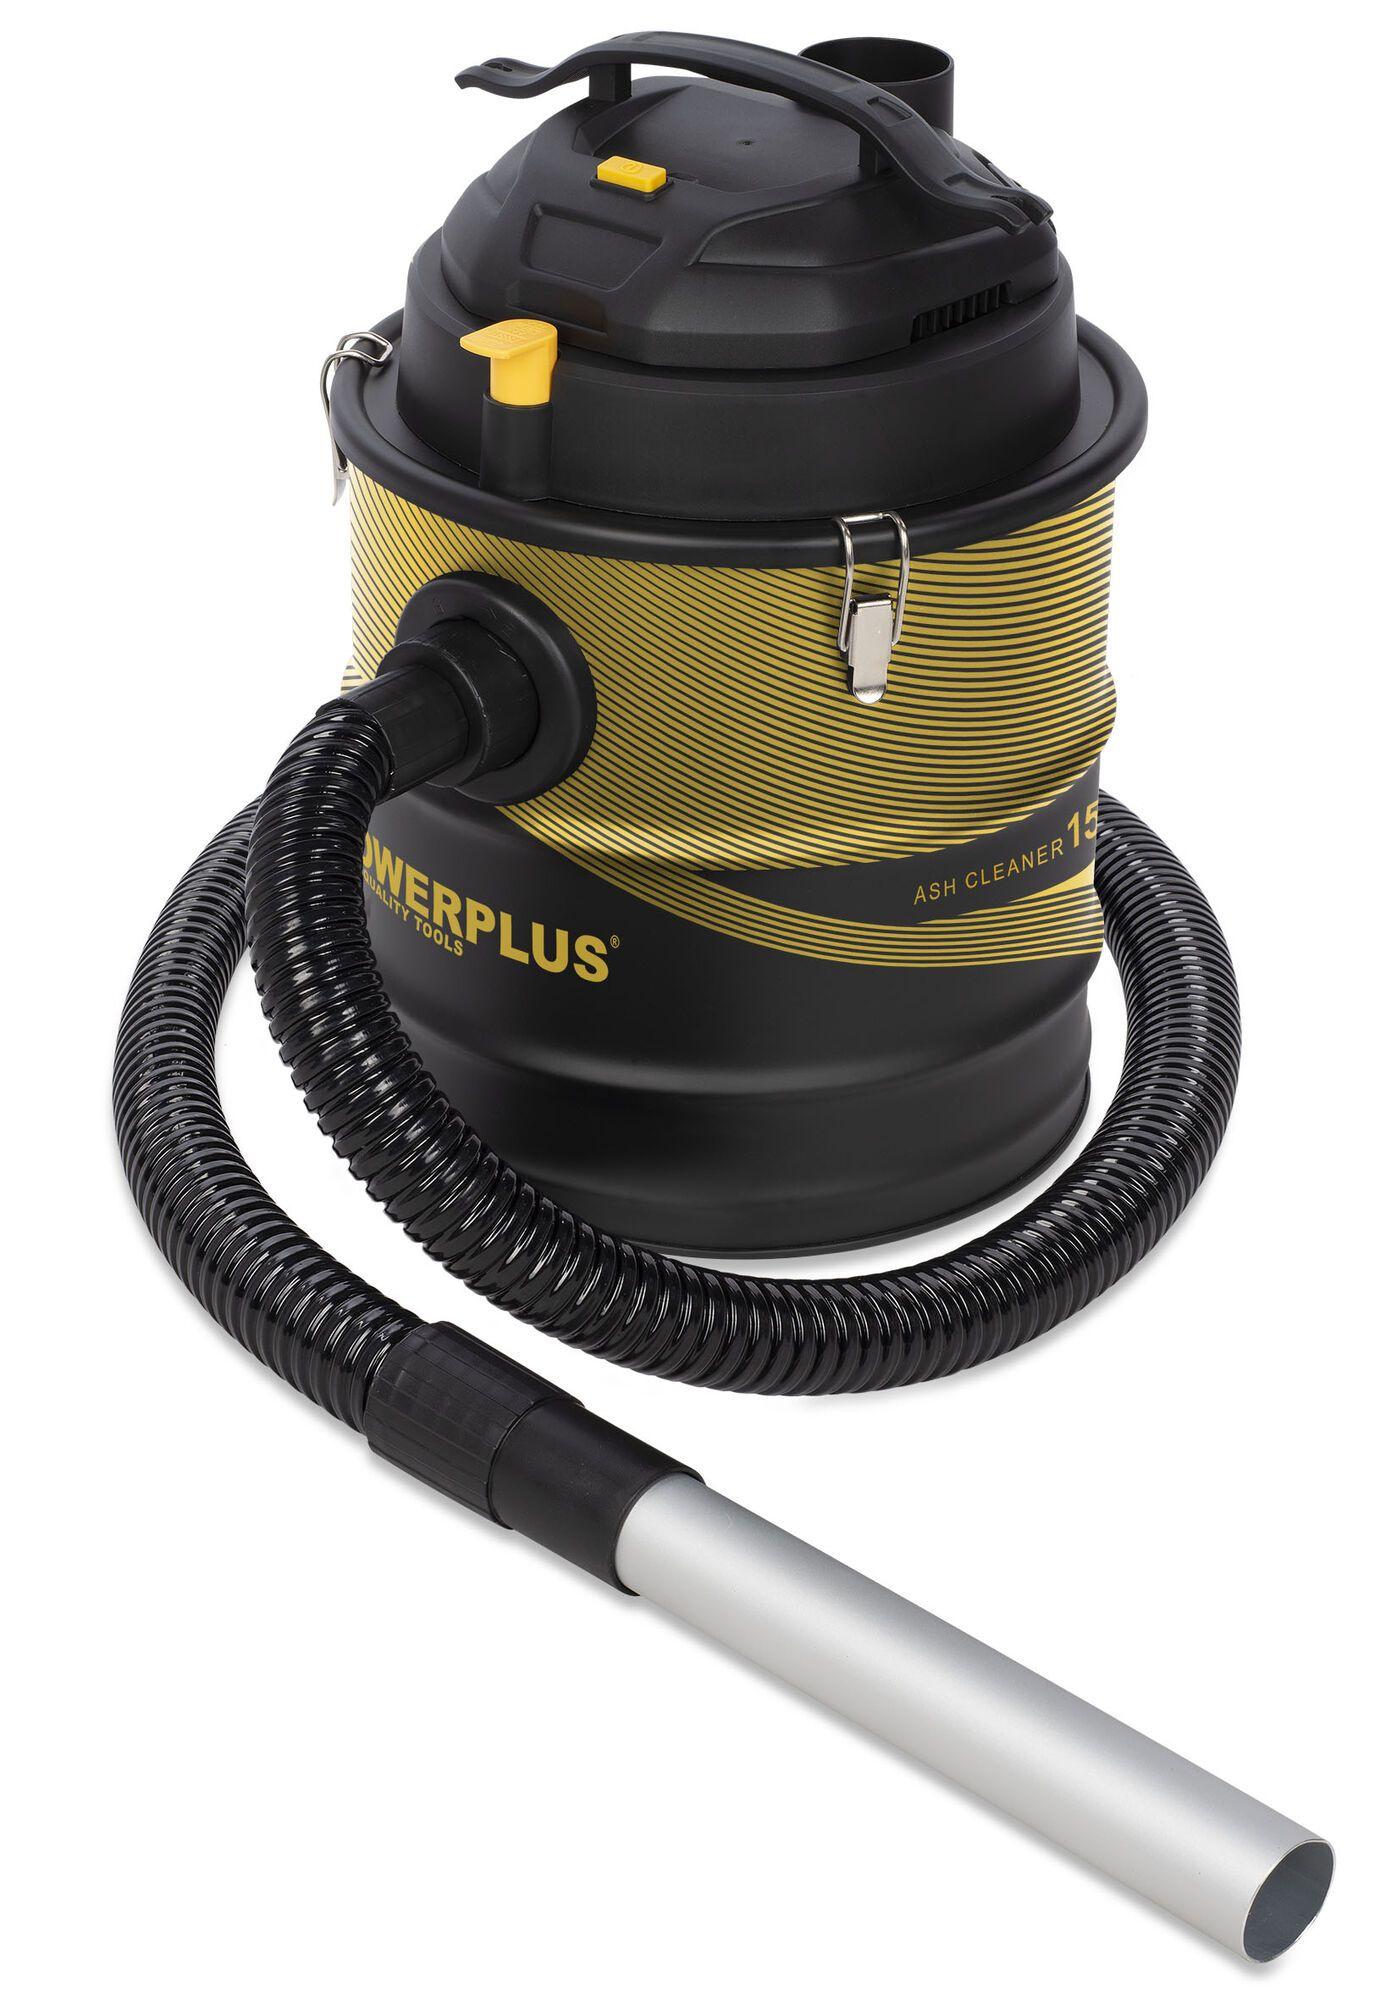 Aszuiger Powerplus POWX312 20 liter   As Stofzuiger 1500W, Geen stofzuiger nodig